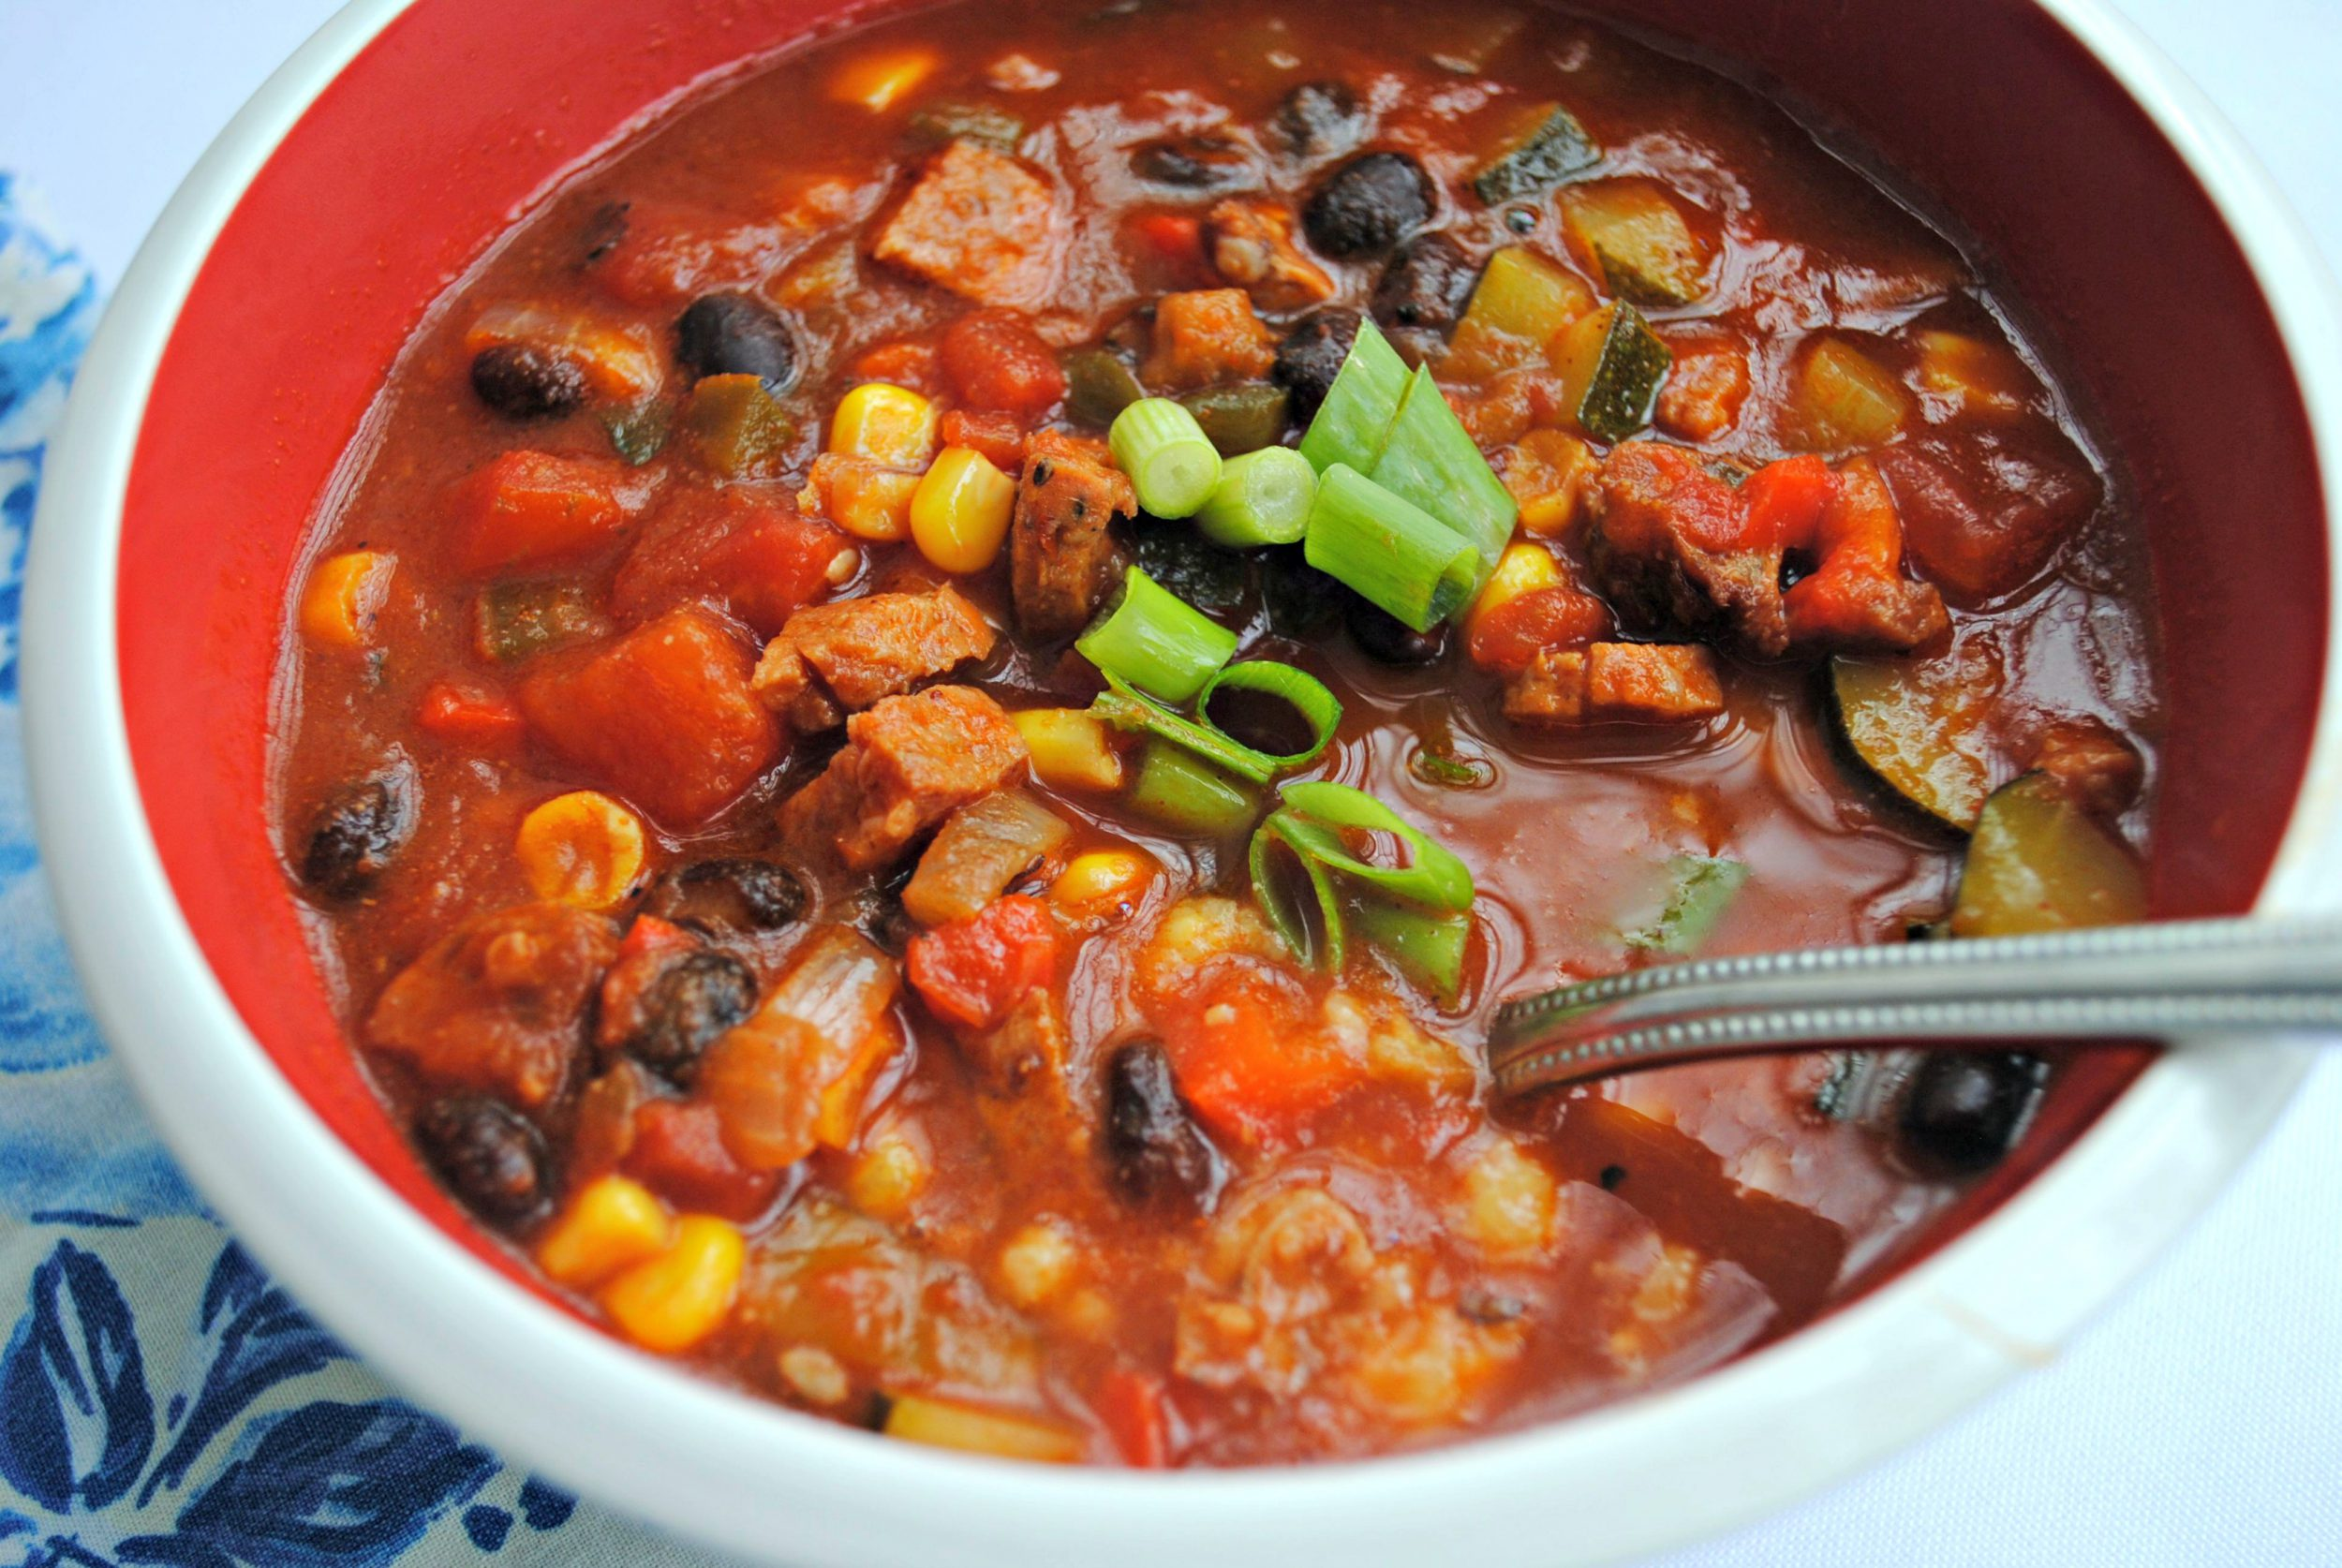 Chorizo and Vegetable Chili in Cheesy Polenta Bowls